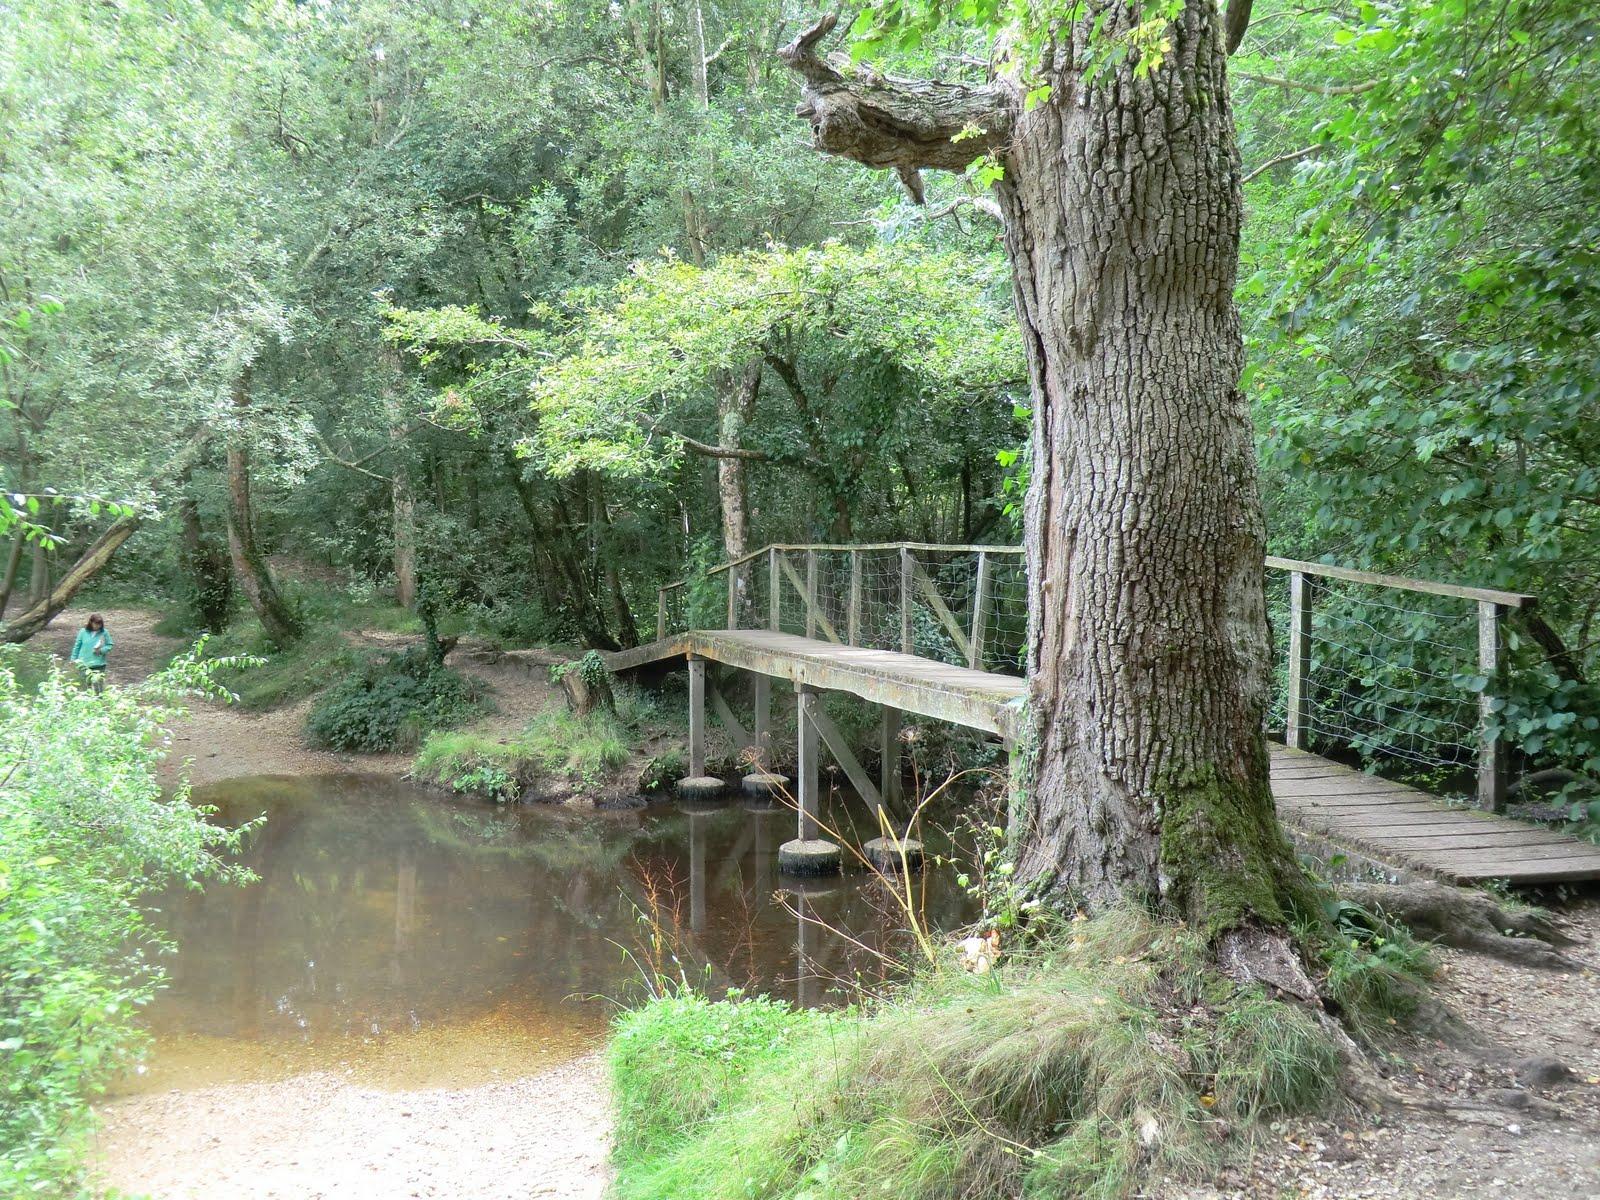 CIMG4286 The Lymington River in Roydon Woods